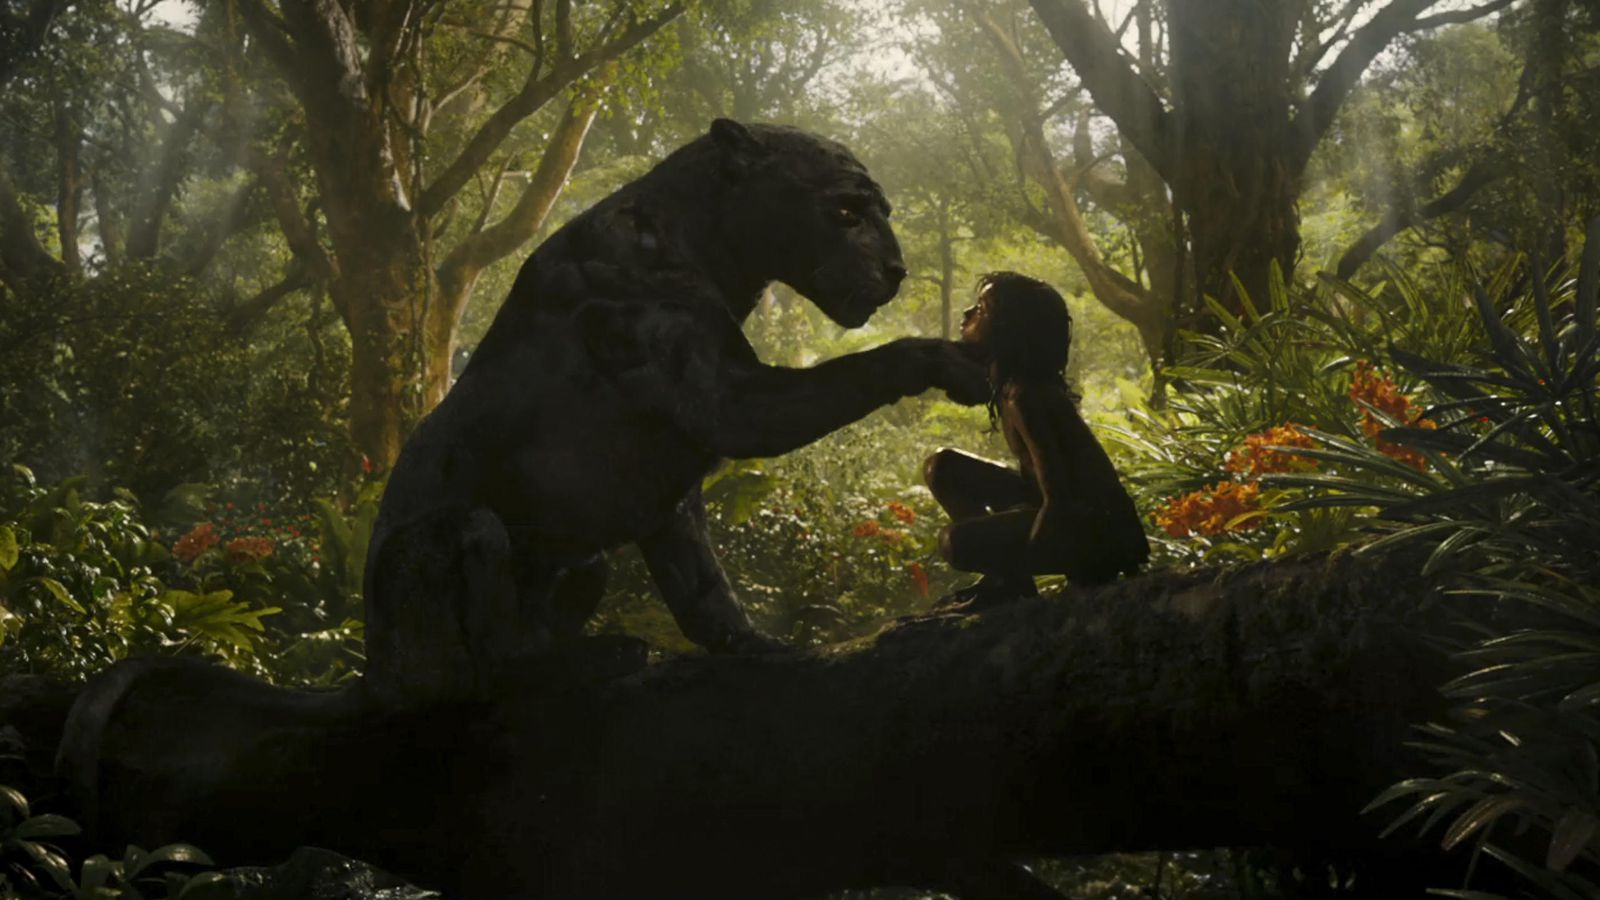 mowgli-andy-serkis-netflix-16.jpg